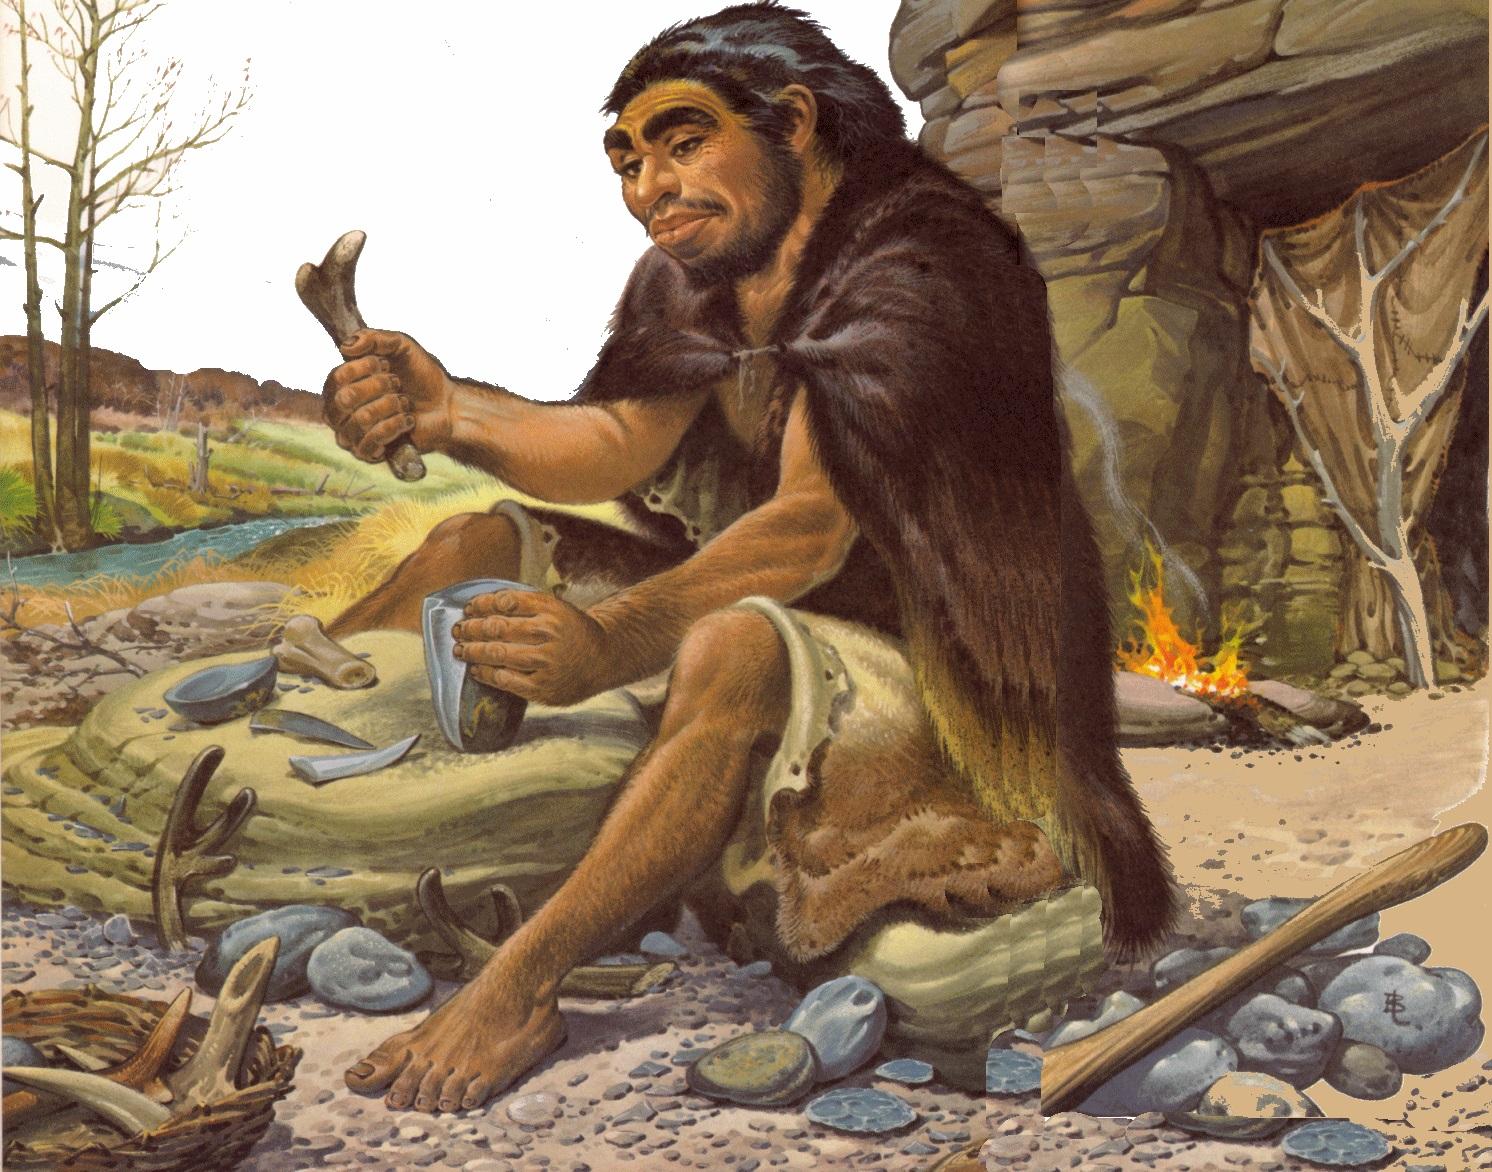 Evoliucijos ratas apsisuko atgal?